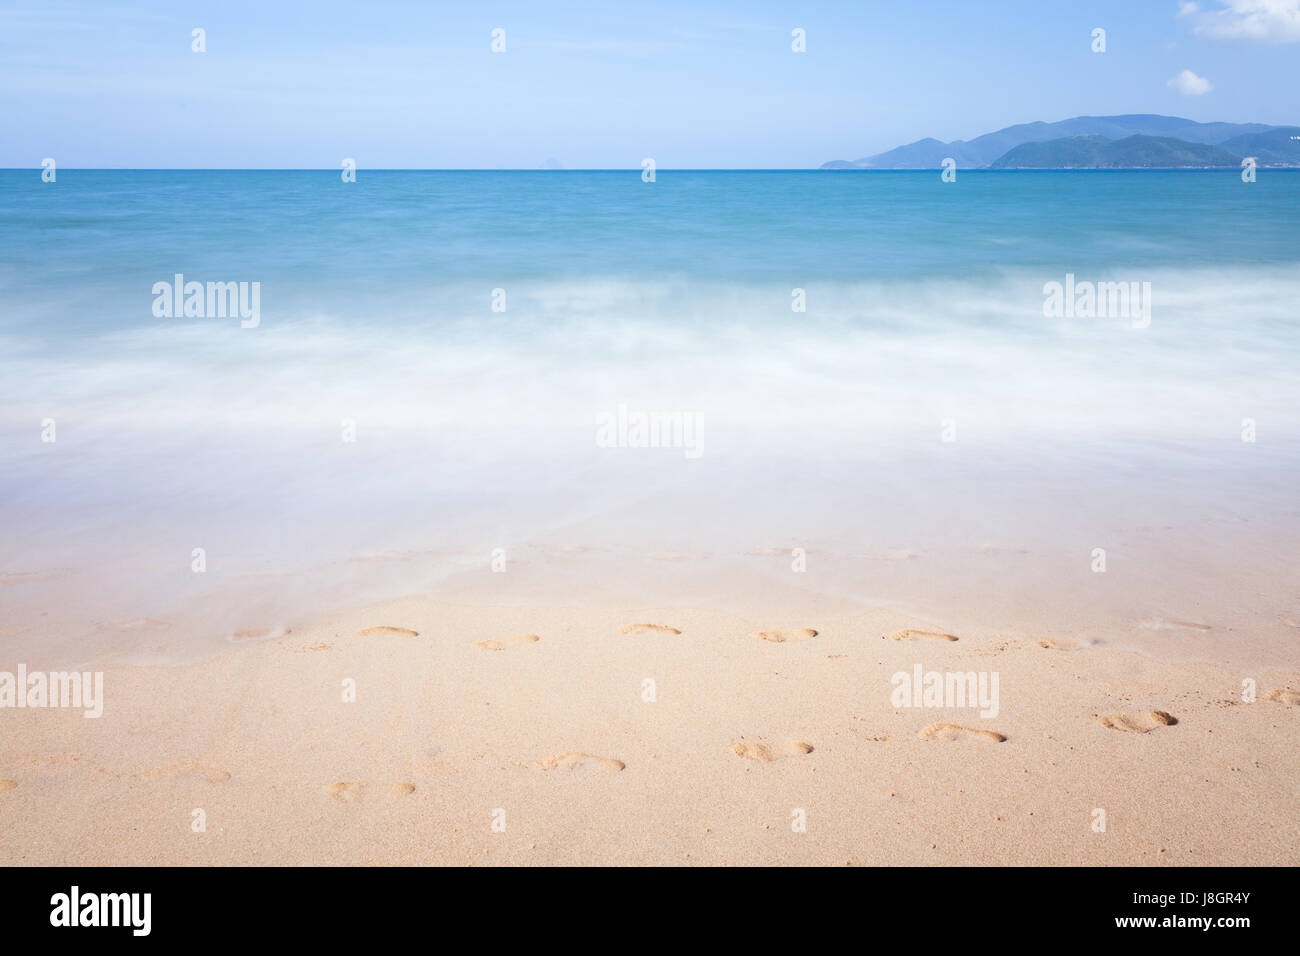 Blurred sea waves motion, Nha Trang, Vietnam. - Stock Image